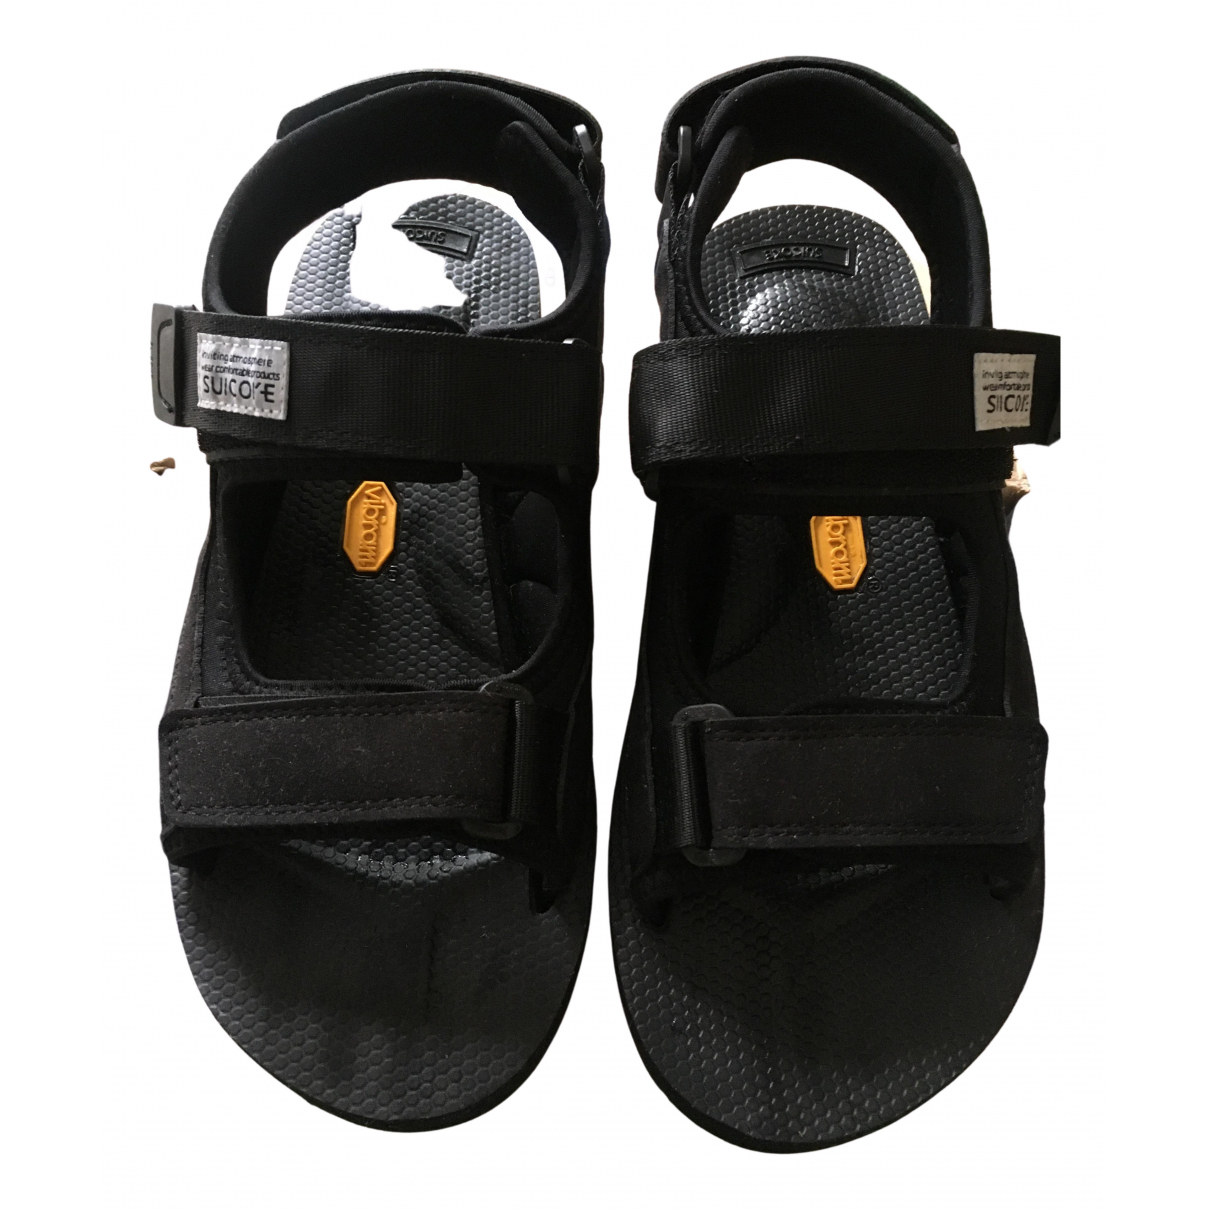 Suicoke N Black Sandals for Women 5 UK